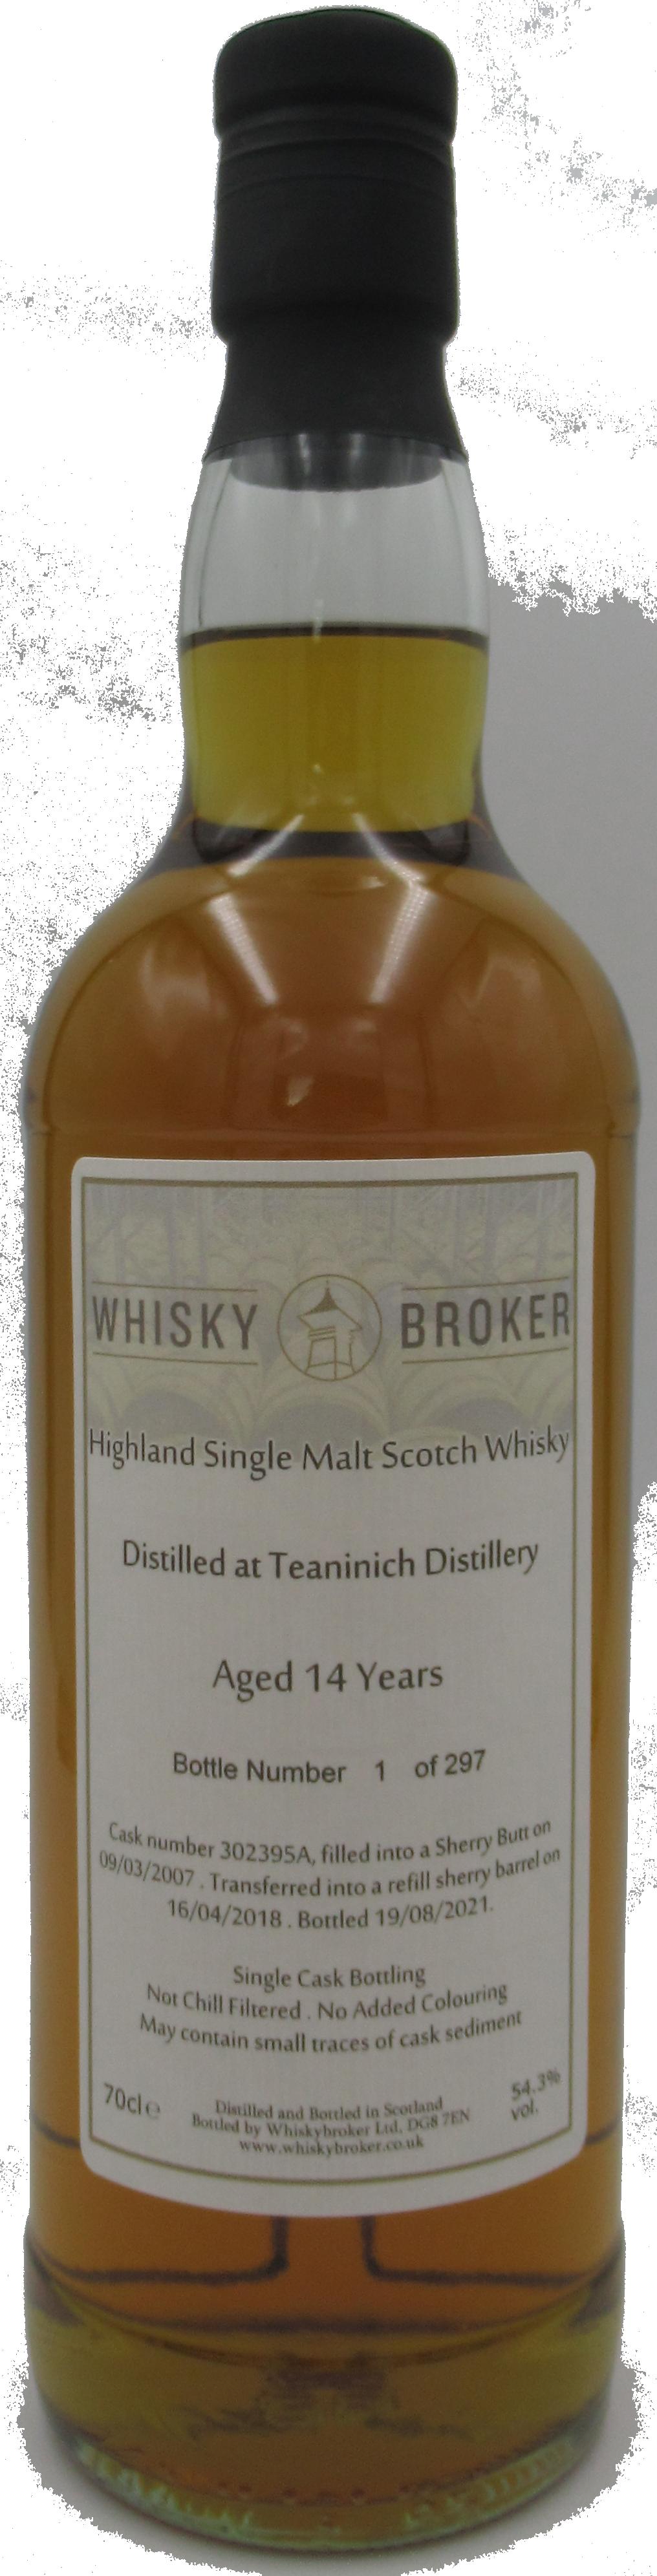 70cl, 14yo Distilled at Teaninich Distillery